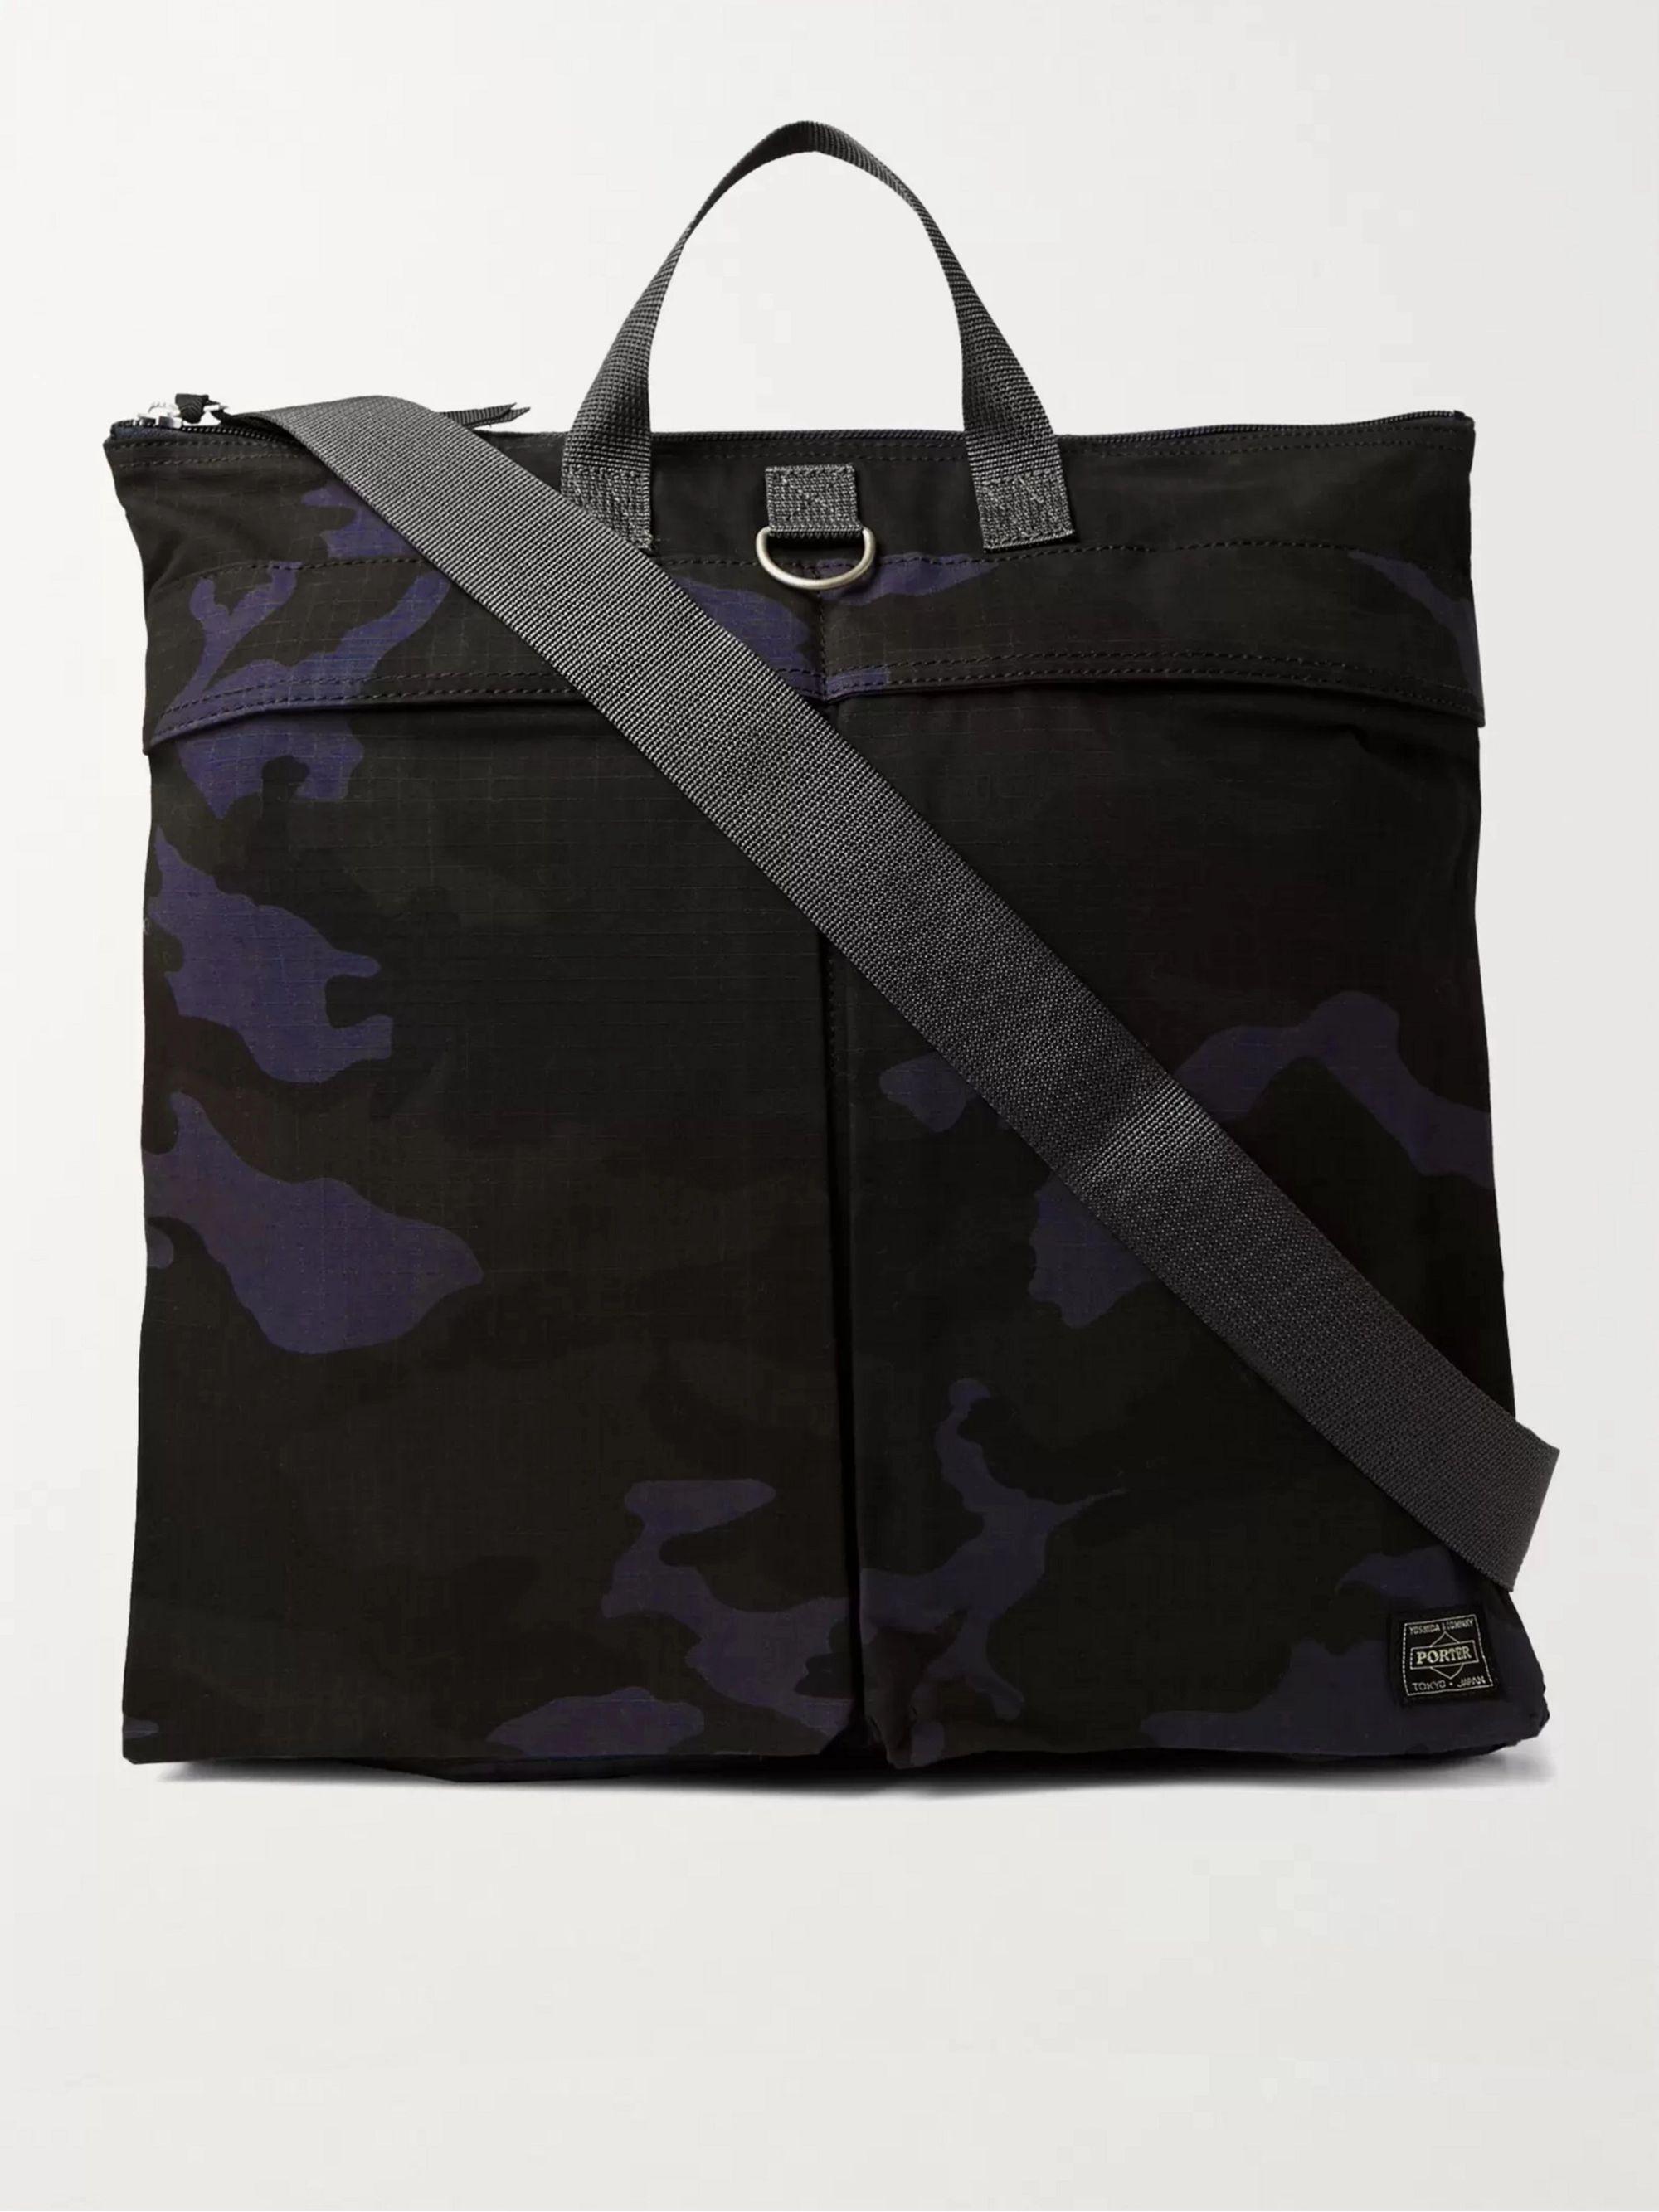 PORTER-YOSHIDA & CO Platoon Camouflage-Print Ripstop Tote Bag,Navy